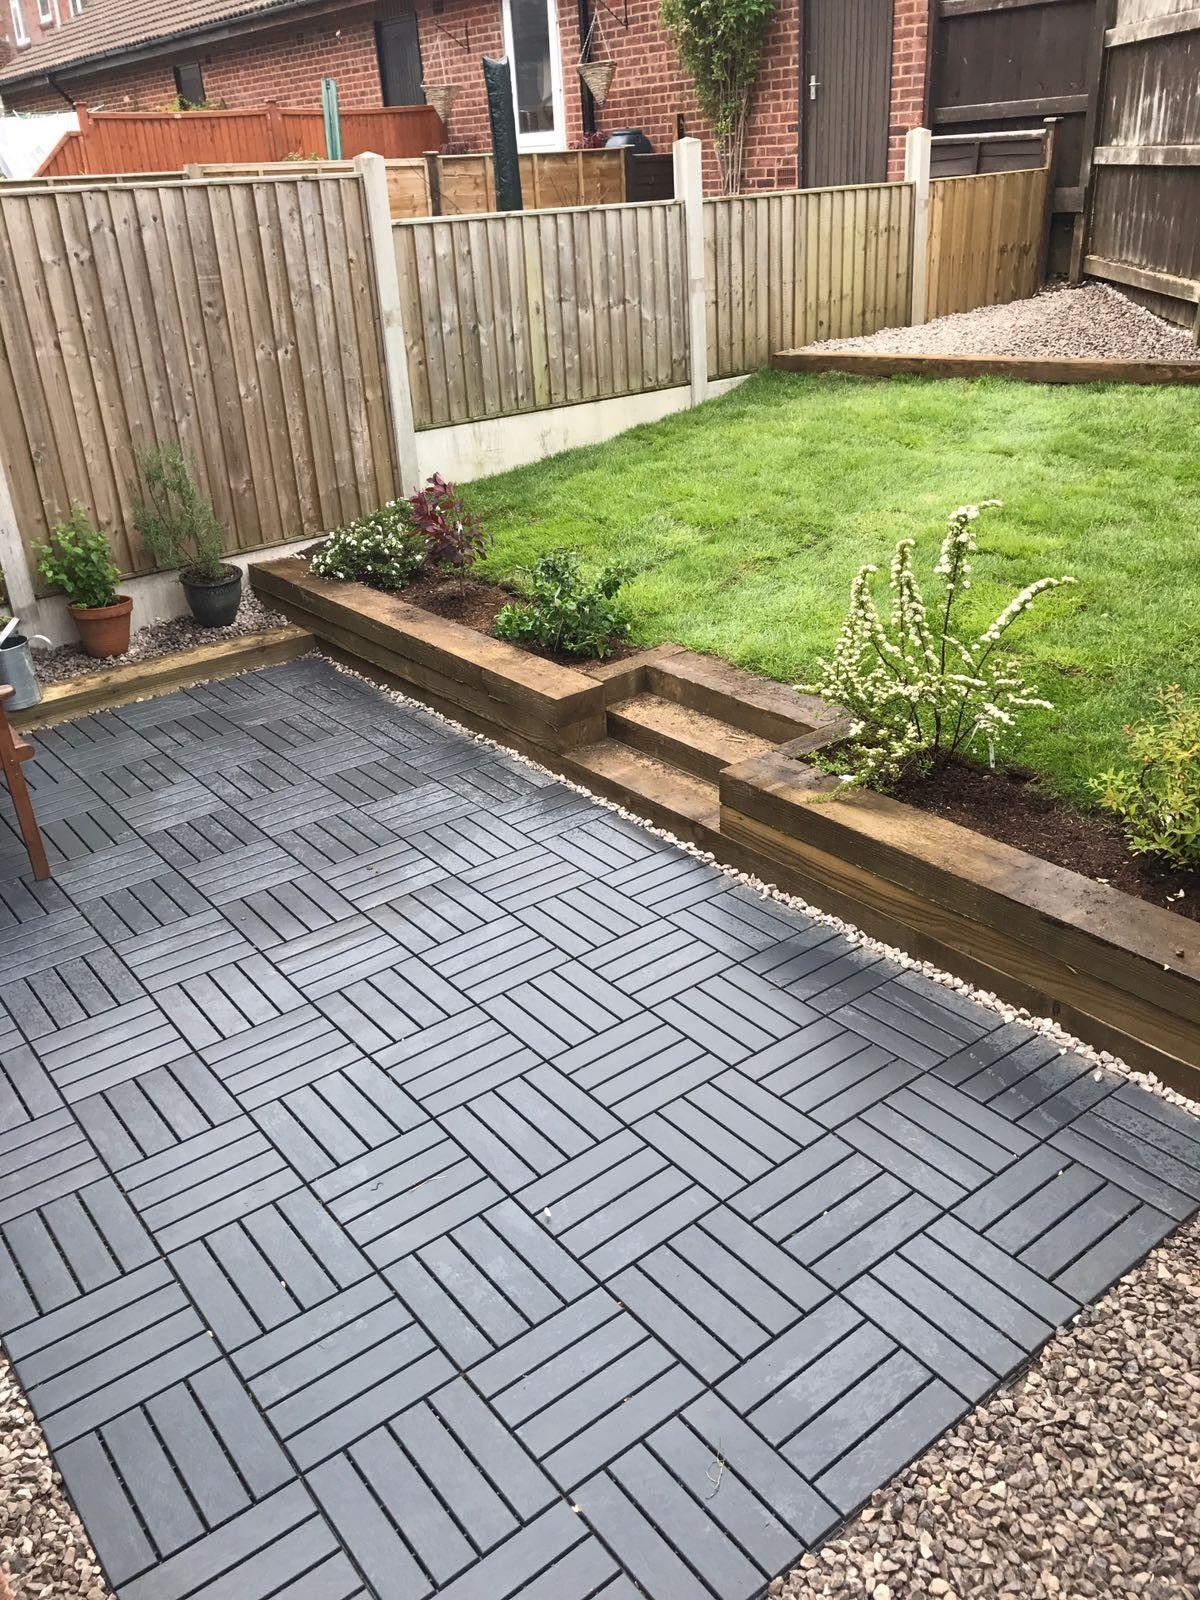 Ikea Runnen Decking Tiles Used To Create A New Garden Patio